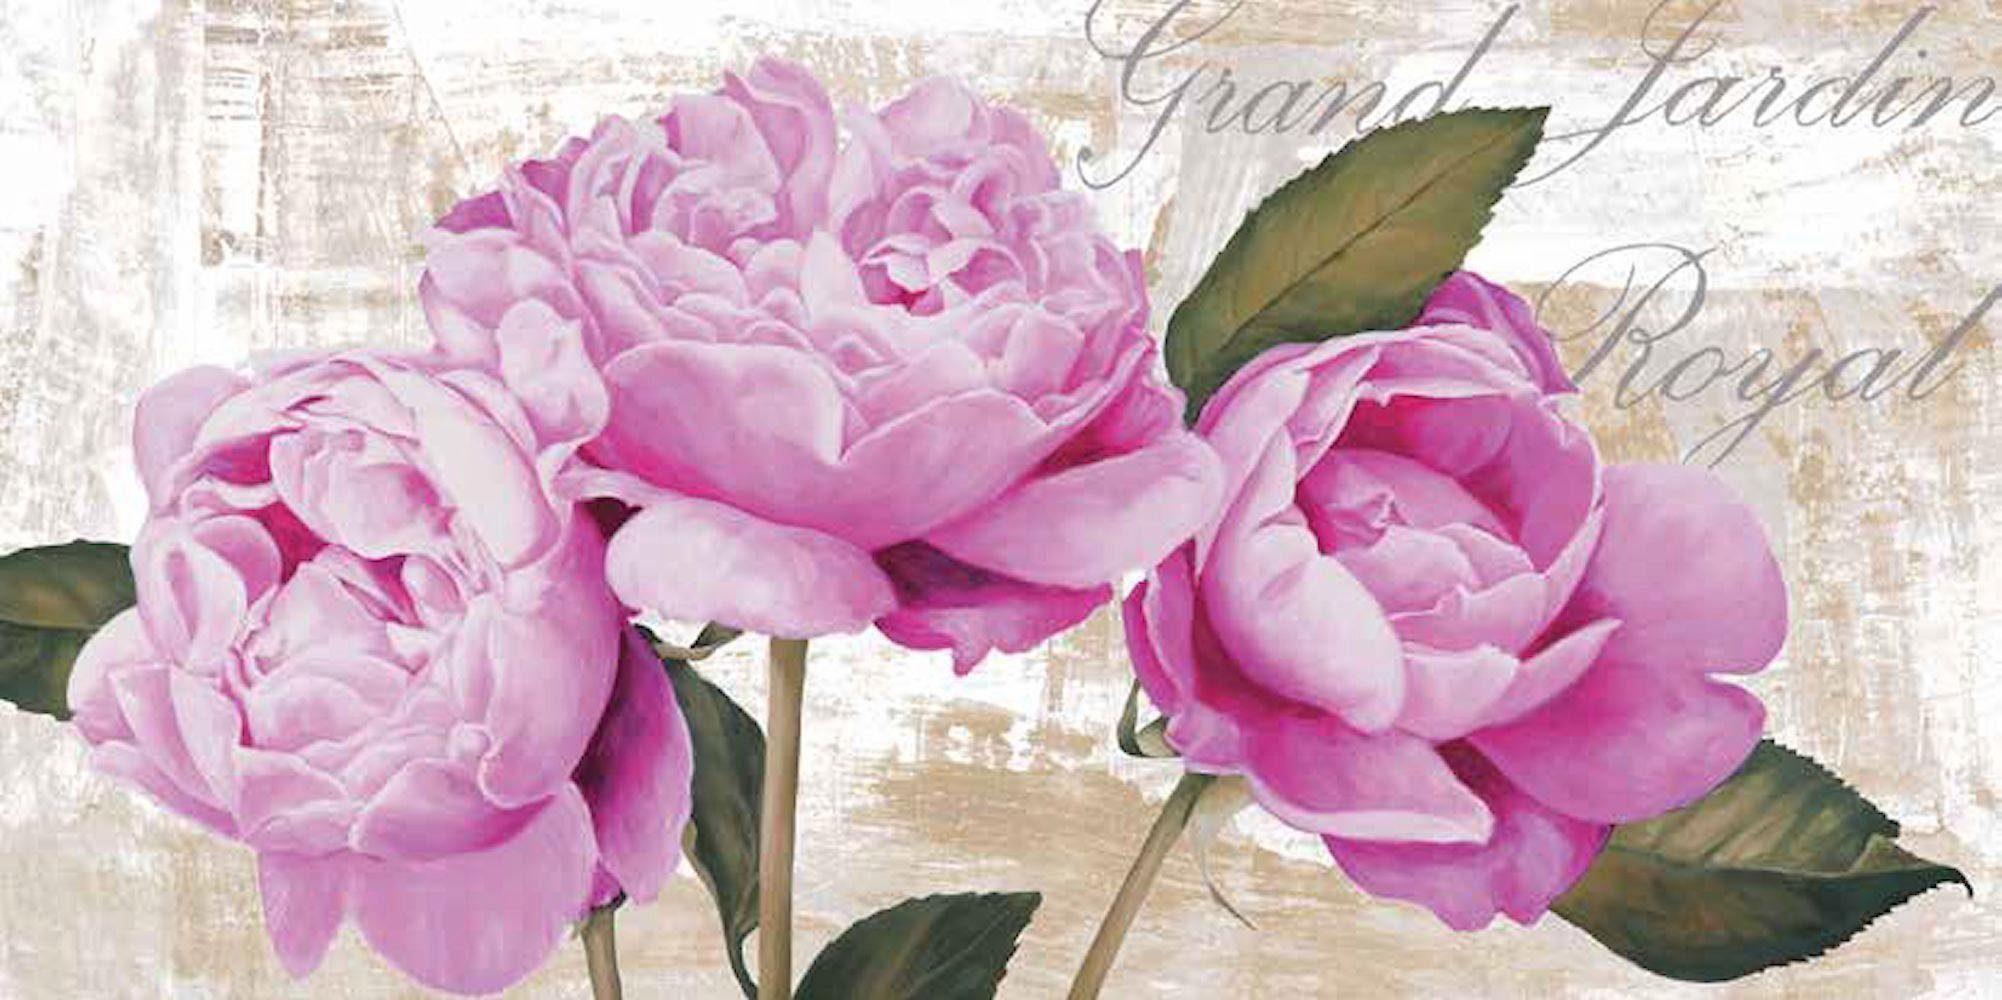 Home Affaire Deco Panel, »Jenny Thomlinson /Grand Jardin Royal«, 100/50/2 cm